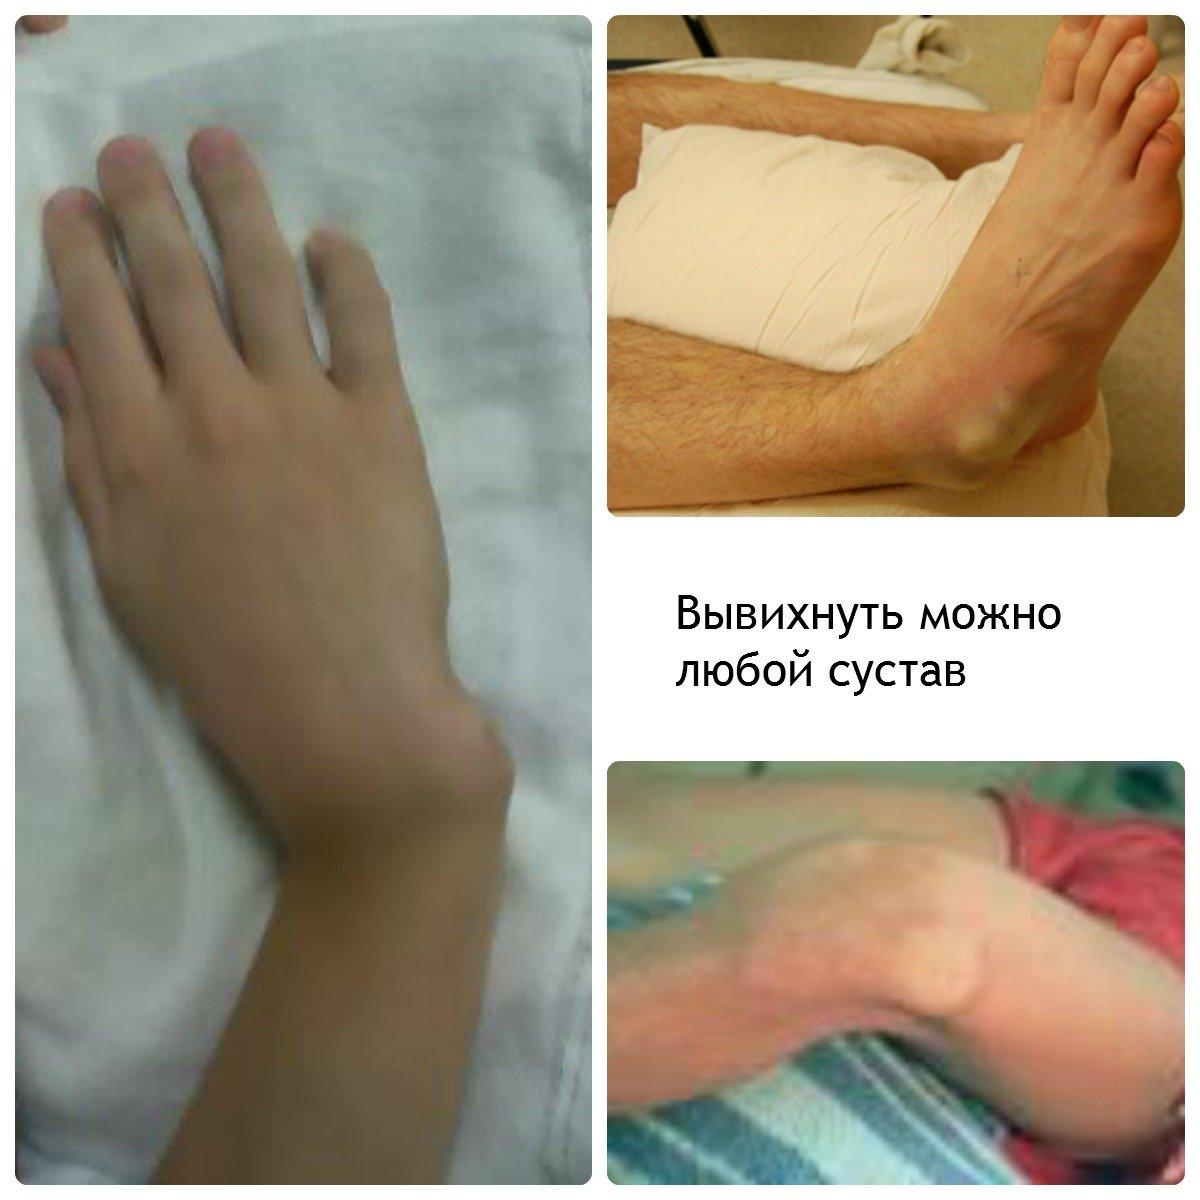 Вывихнуть сустав перелом сустава ноги